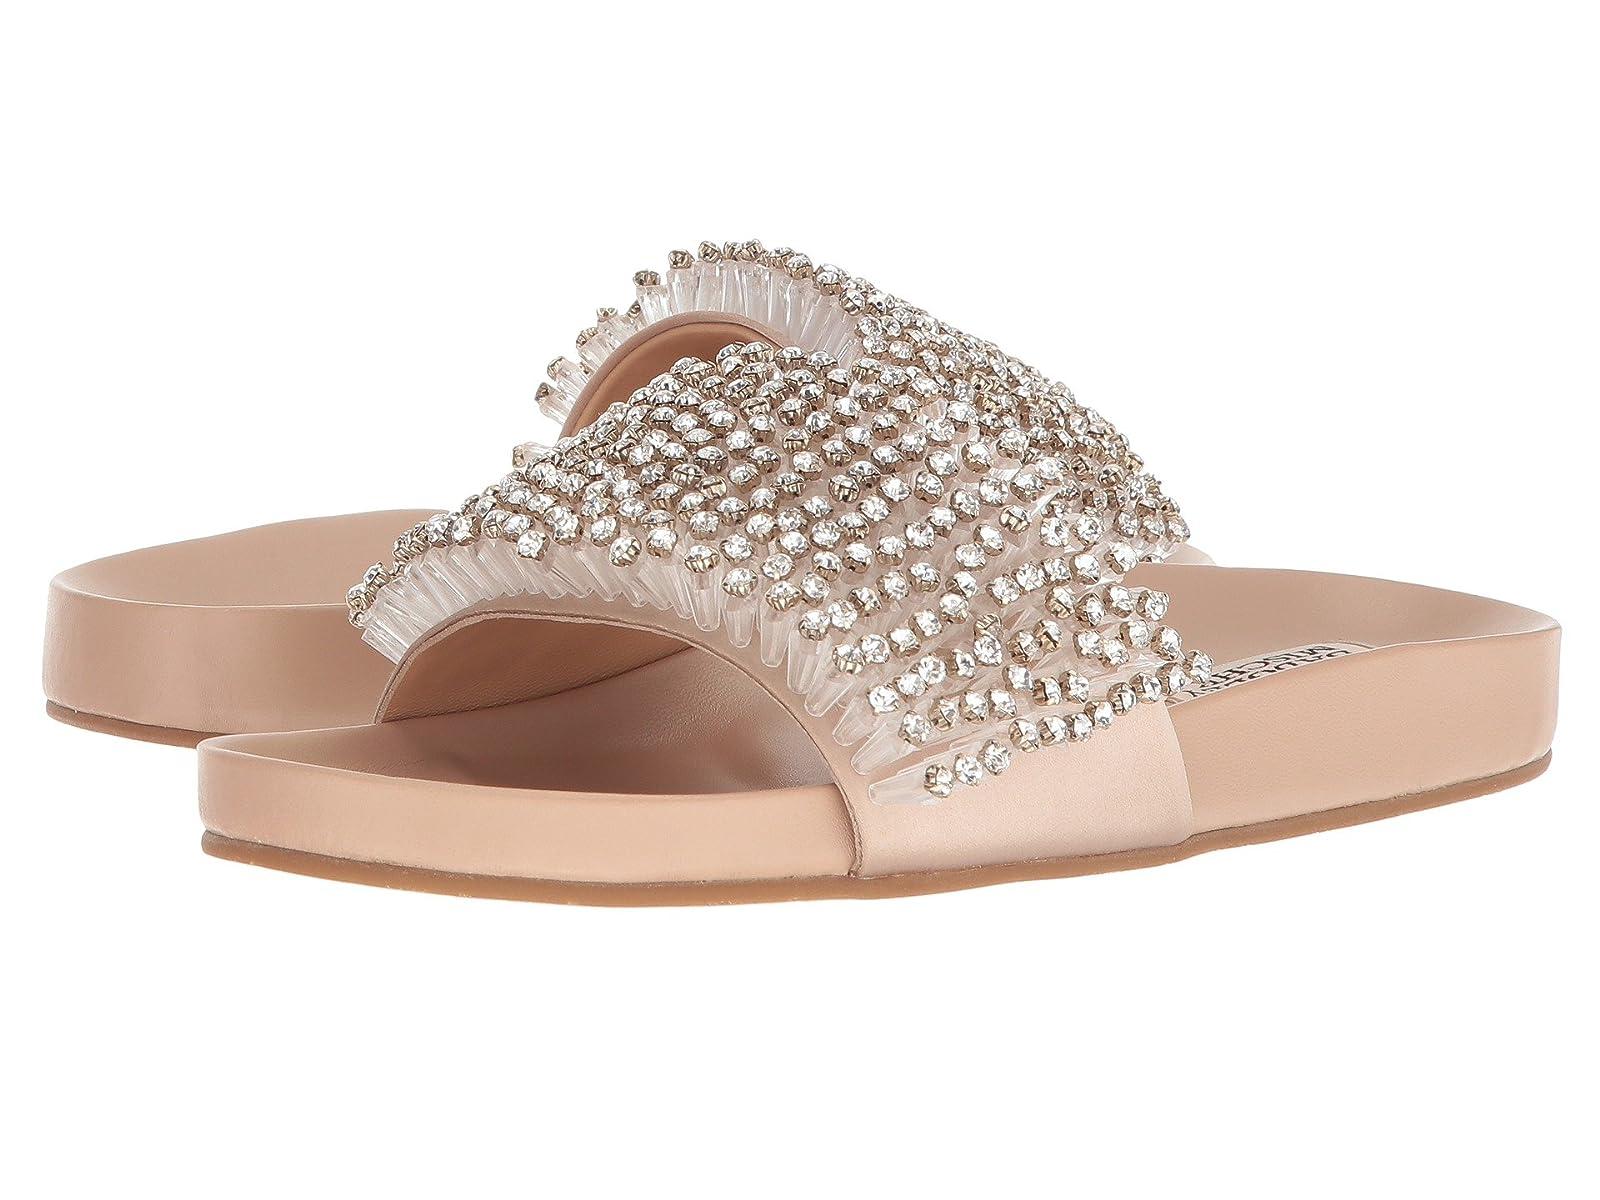 Badgley Mischka HortonCheap and distinctive eye-catching shoes